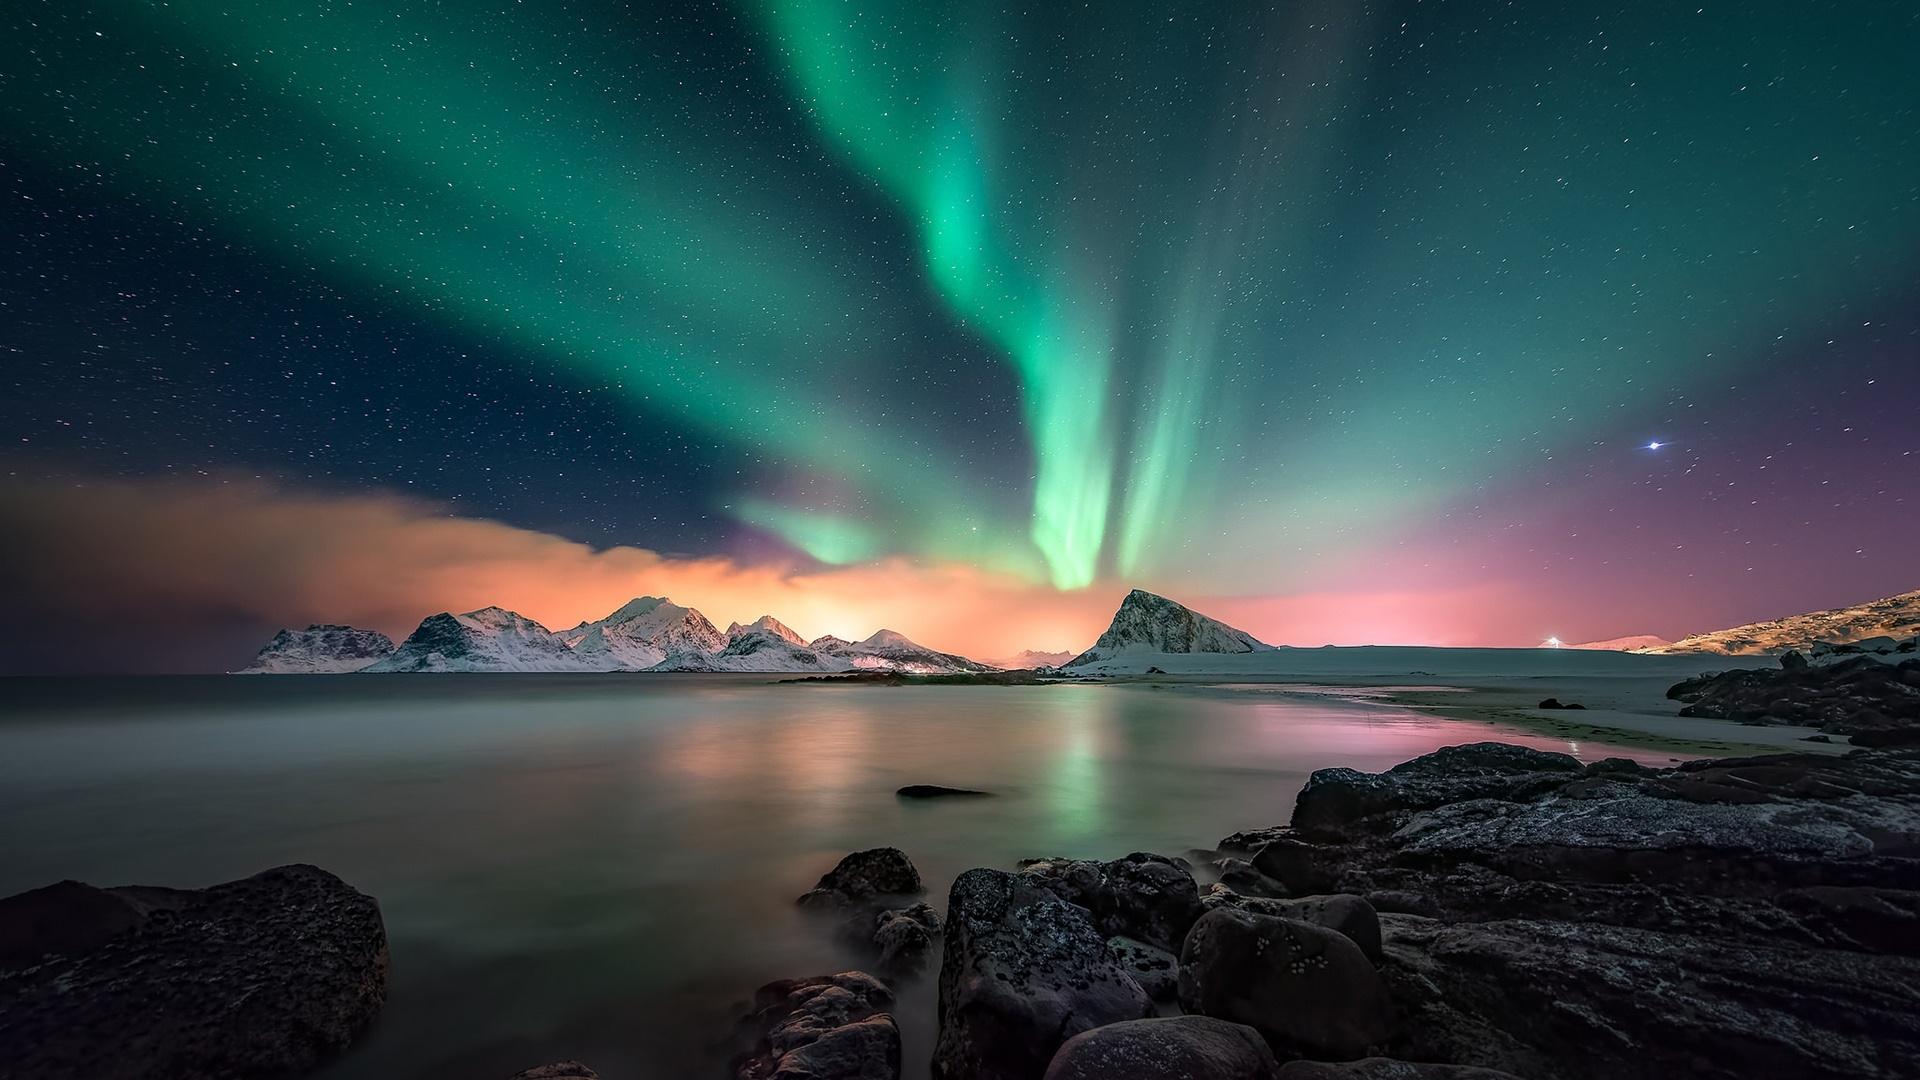 Northern lights above Lofoten wallpaper